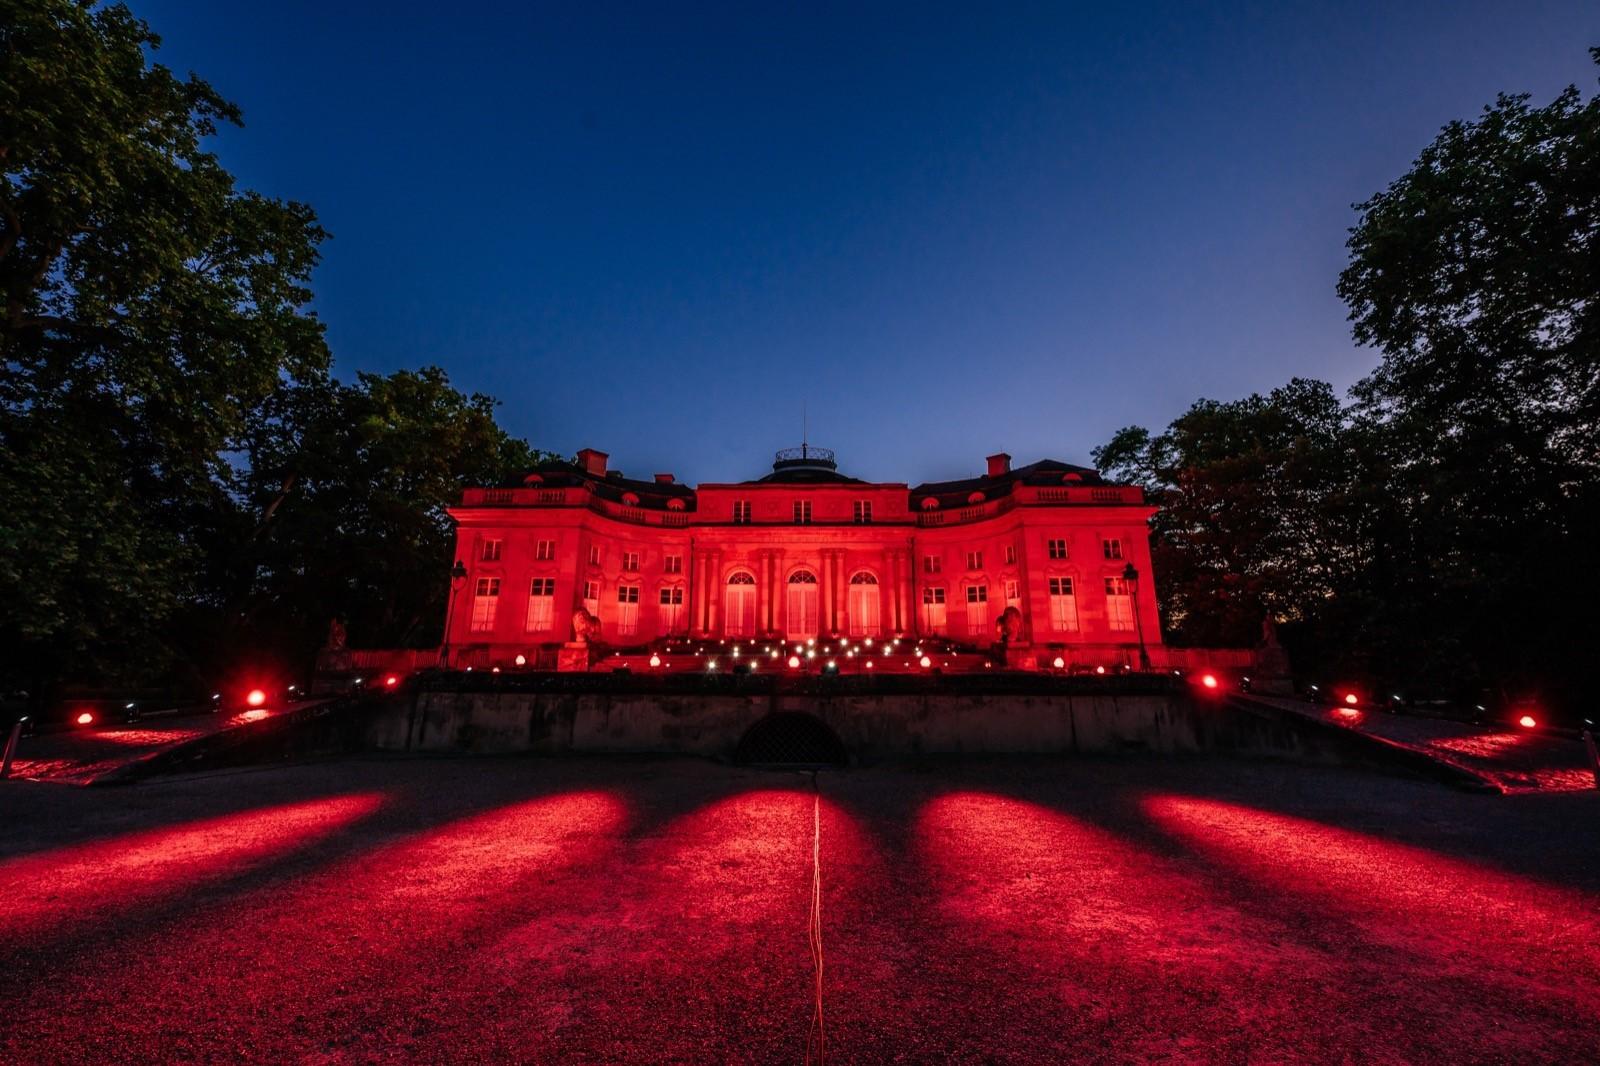 night-of-light-red-alert-germany